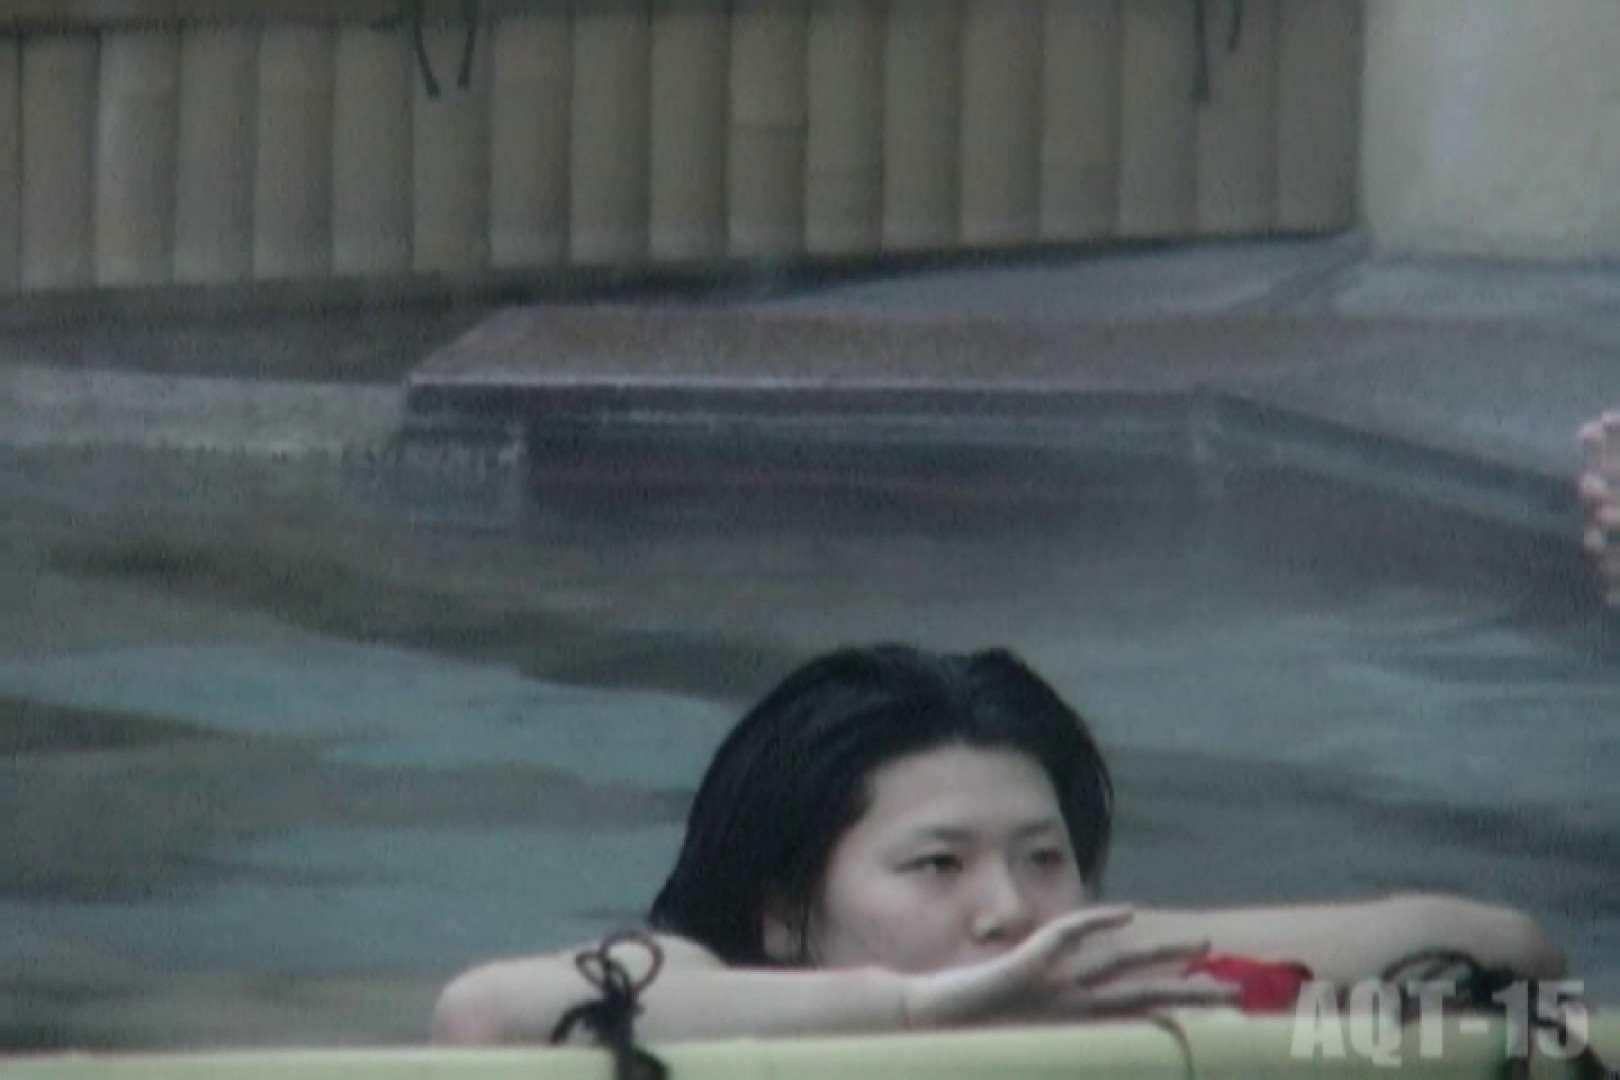 Aquaな露天風呂Vol.837 盗撮映像  107Pix 64